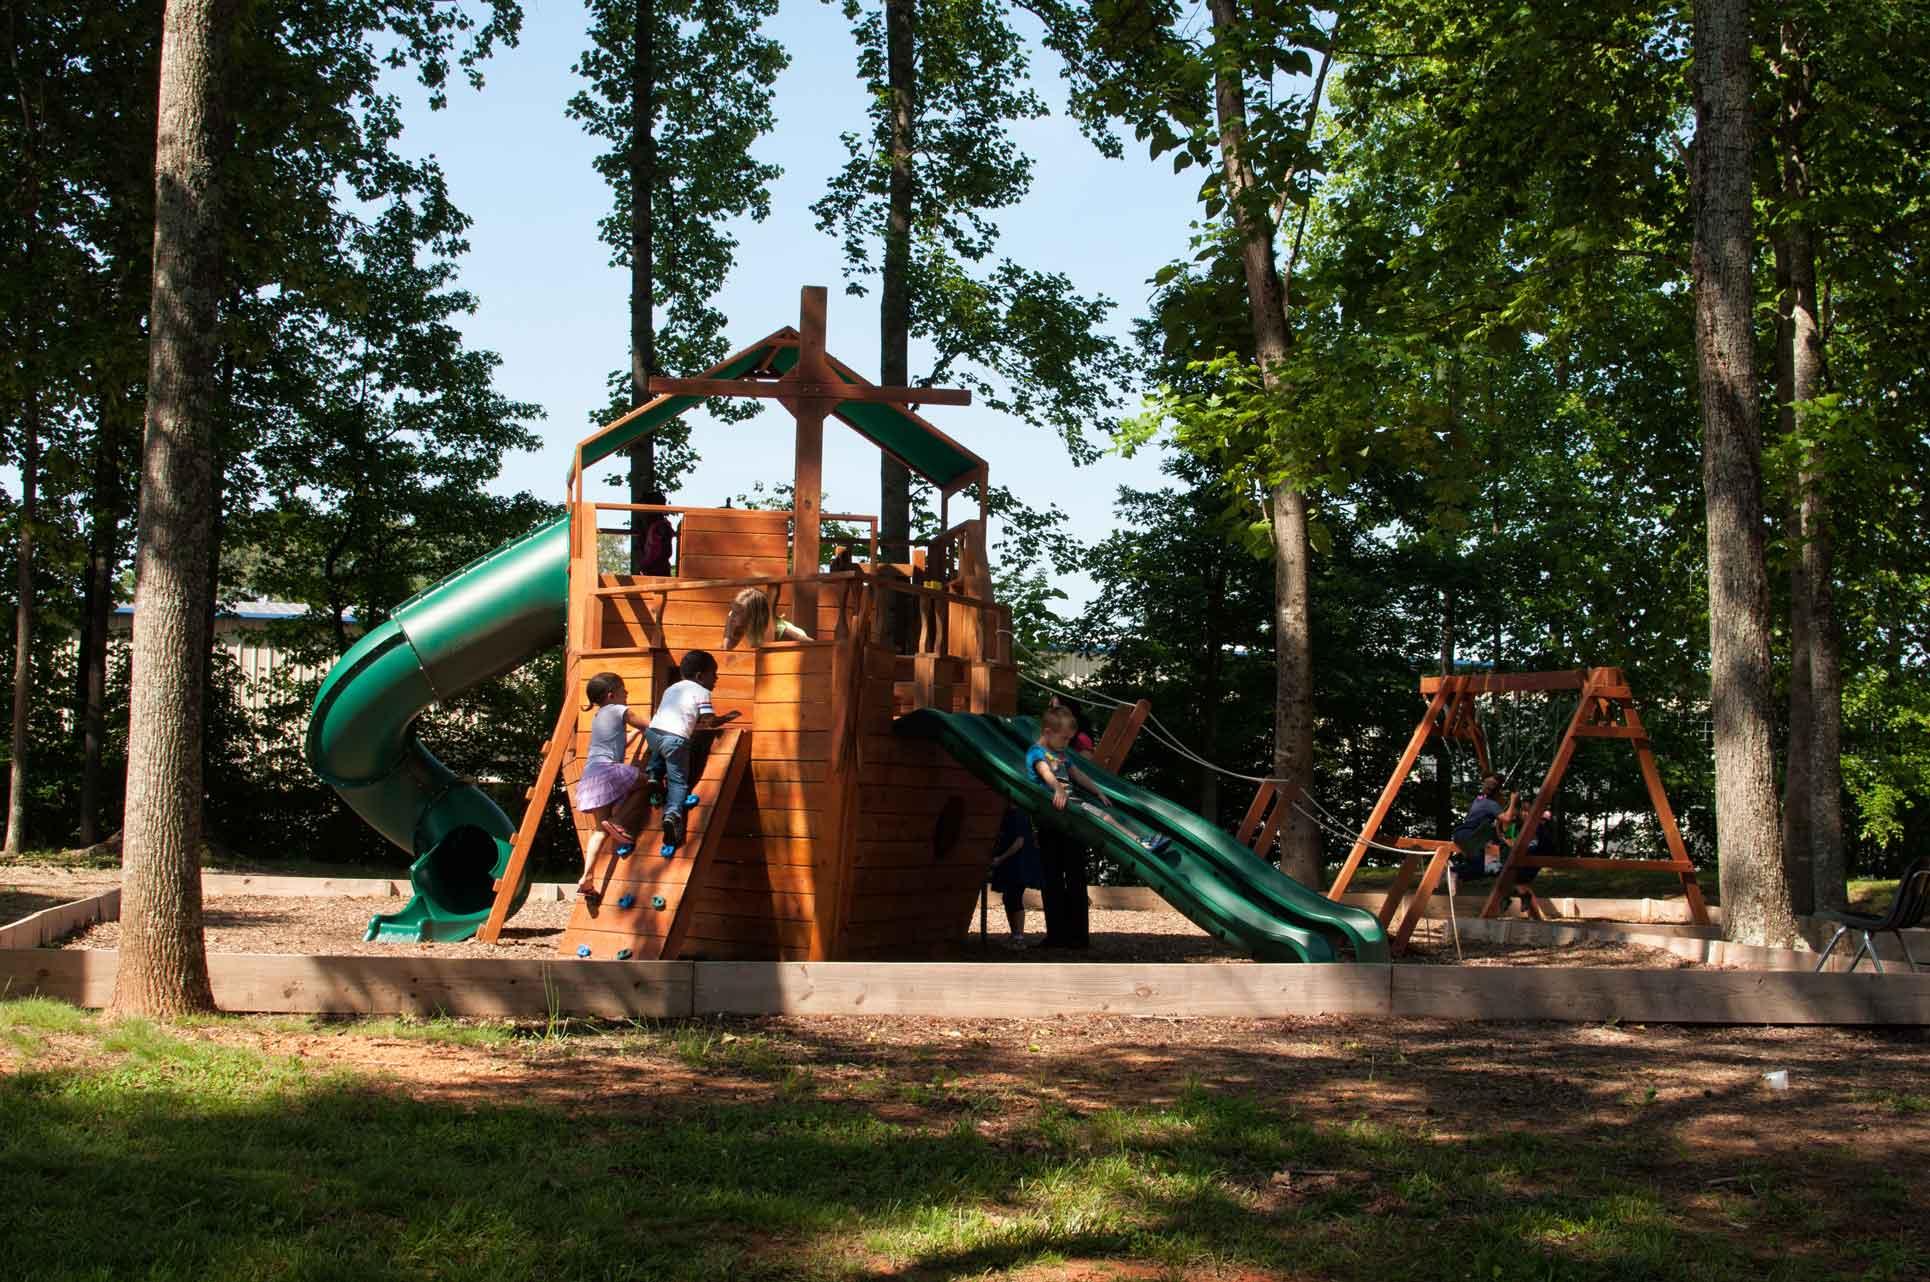 Burlington-Private-Elementary-School-Students-Climbing-Ladder-on-Playground-